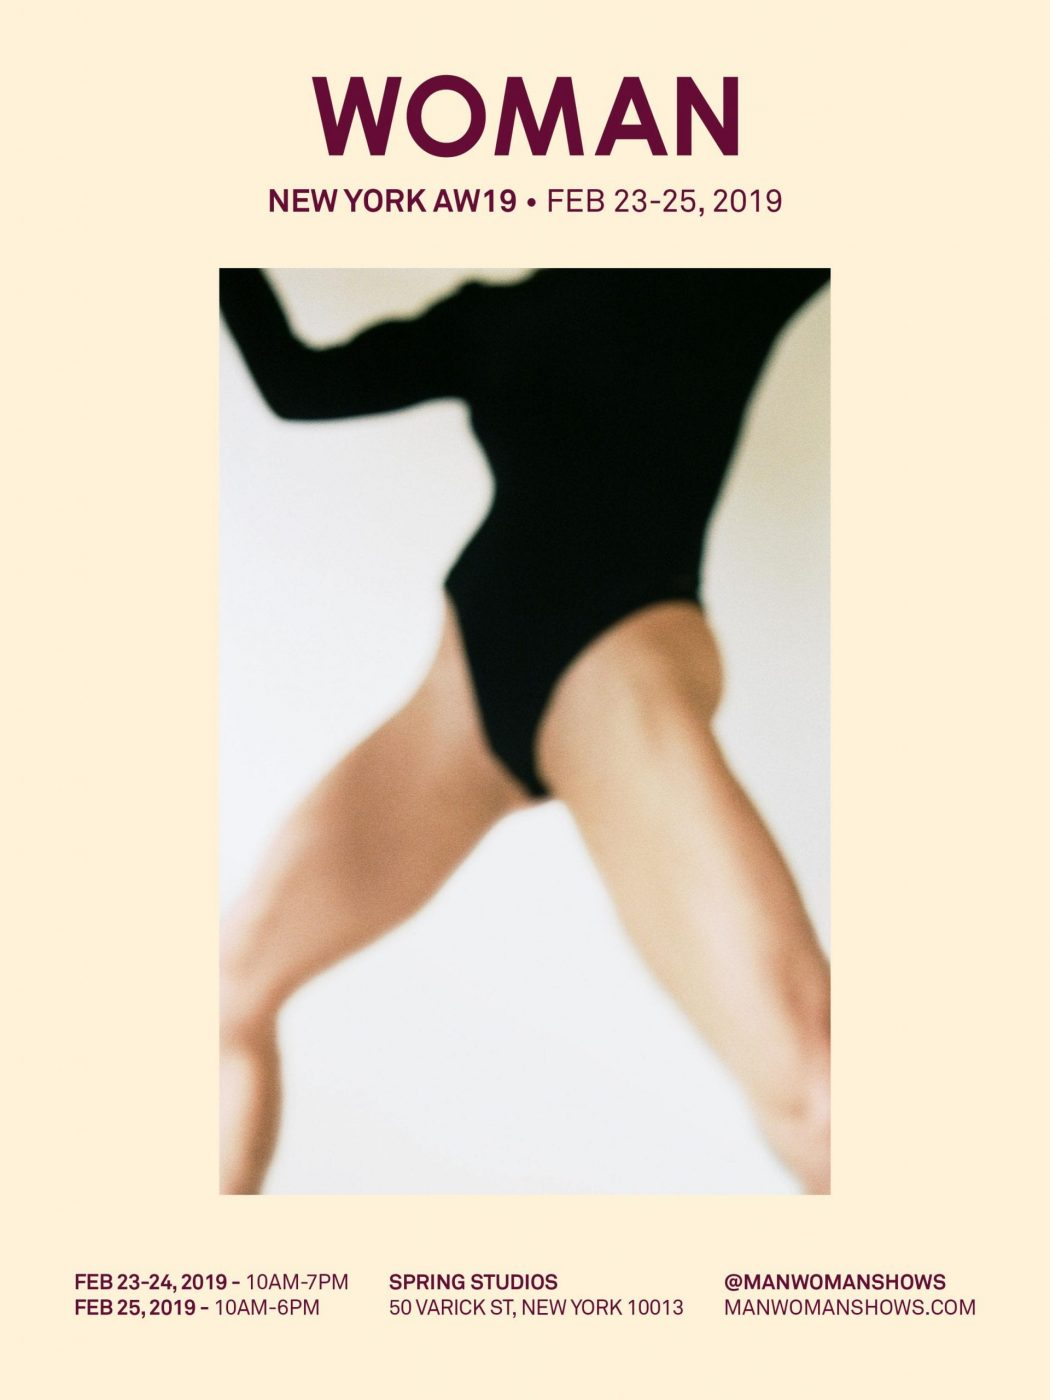 invitation WOMAN NYC AW19